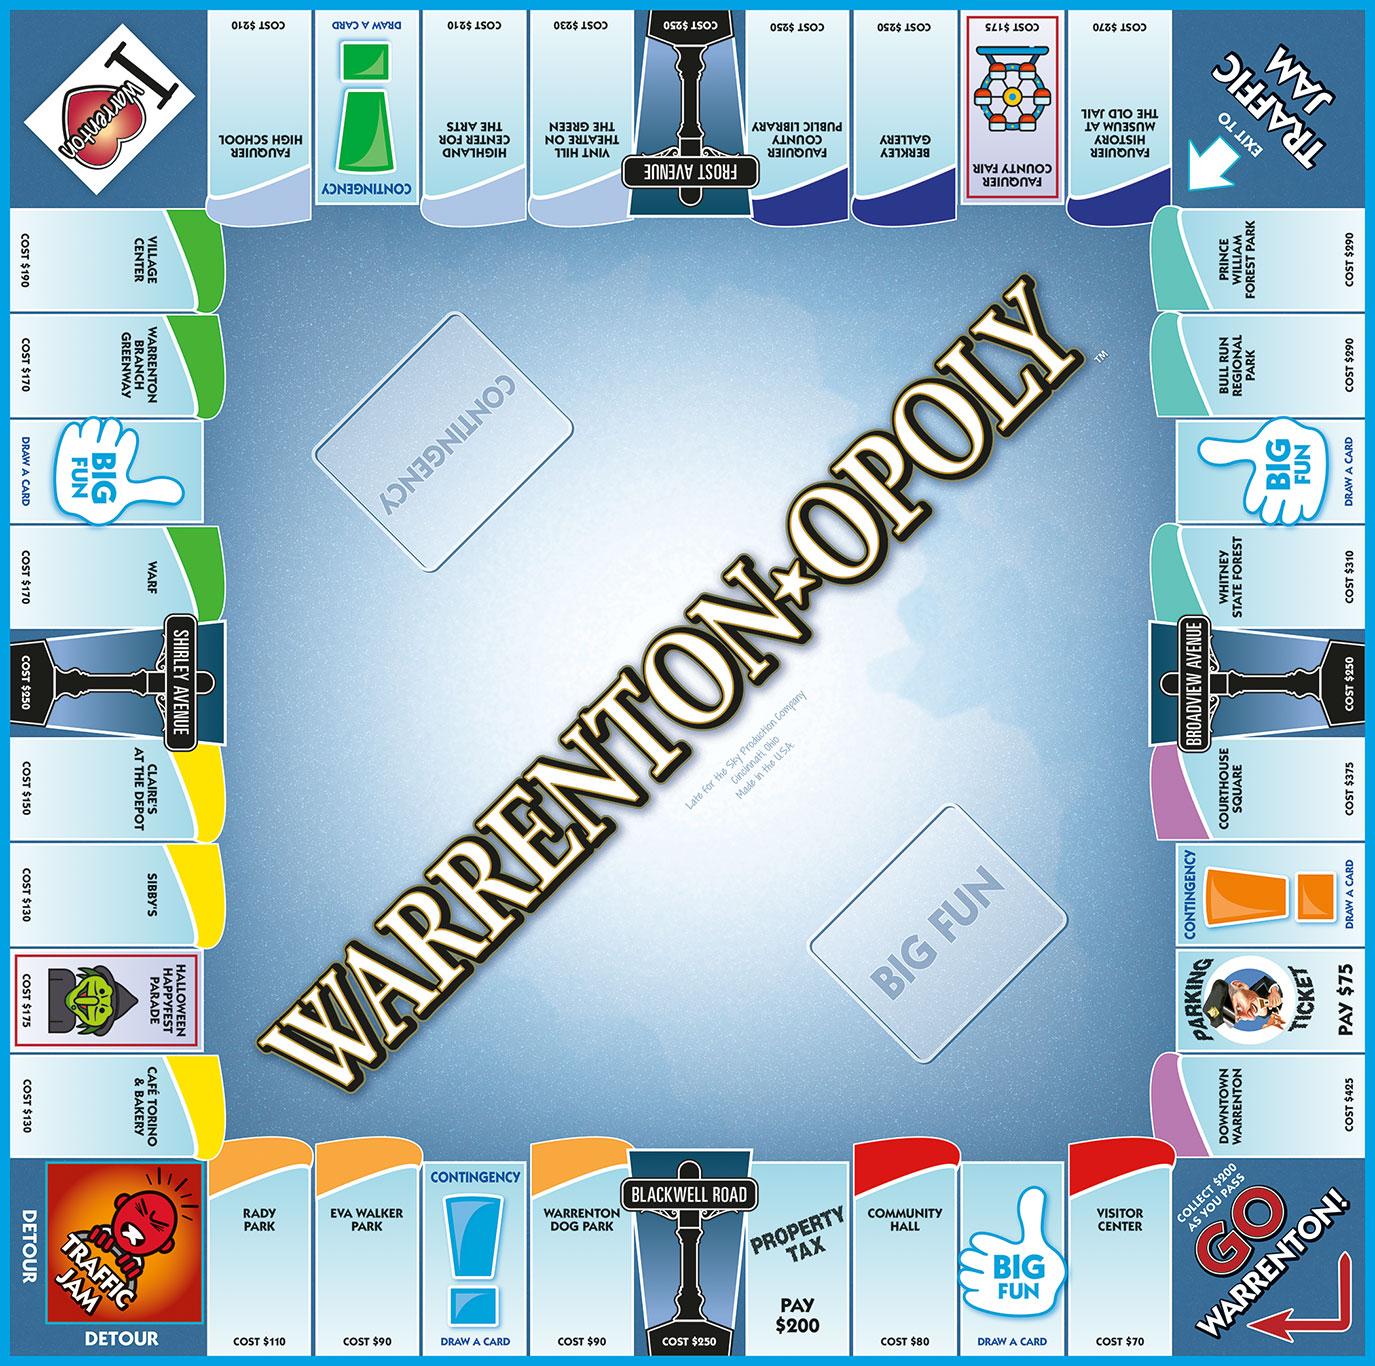 WARRENTON-OPOLY Board Game